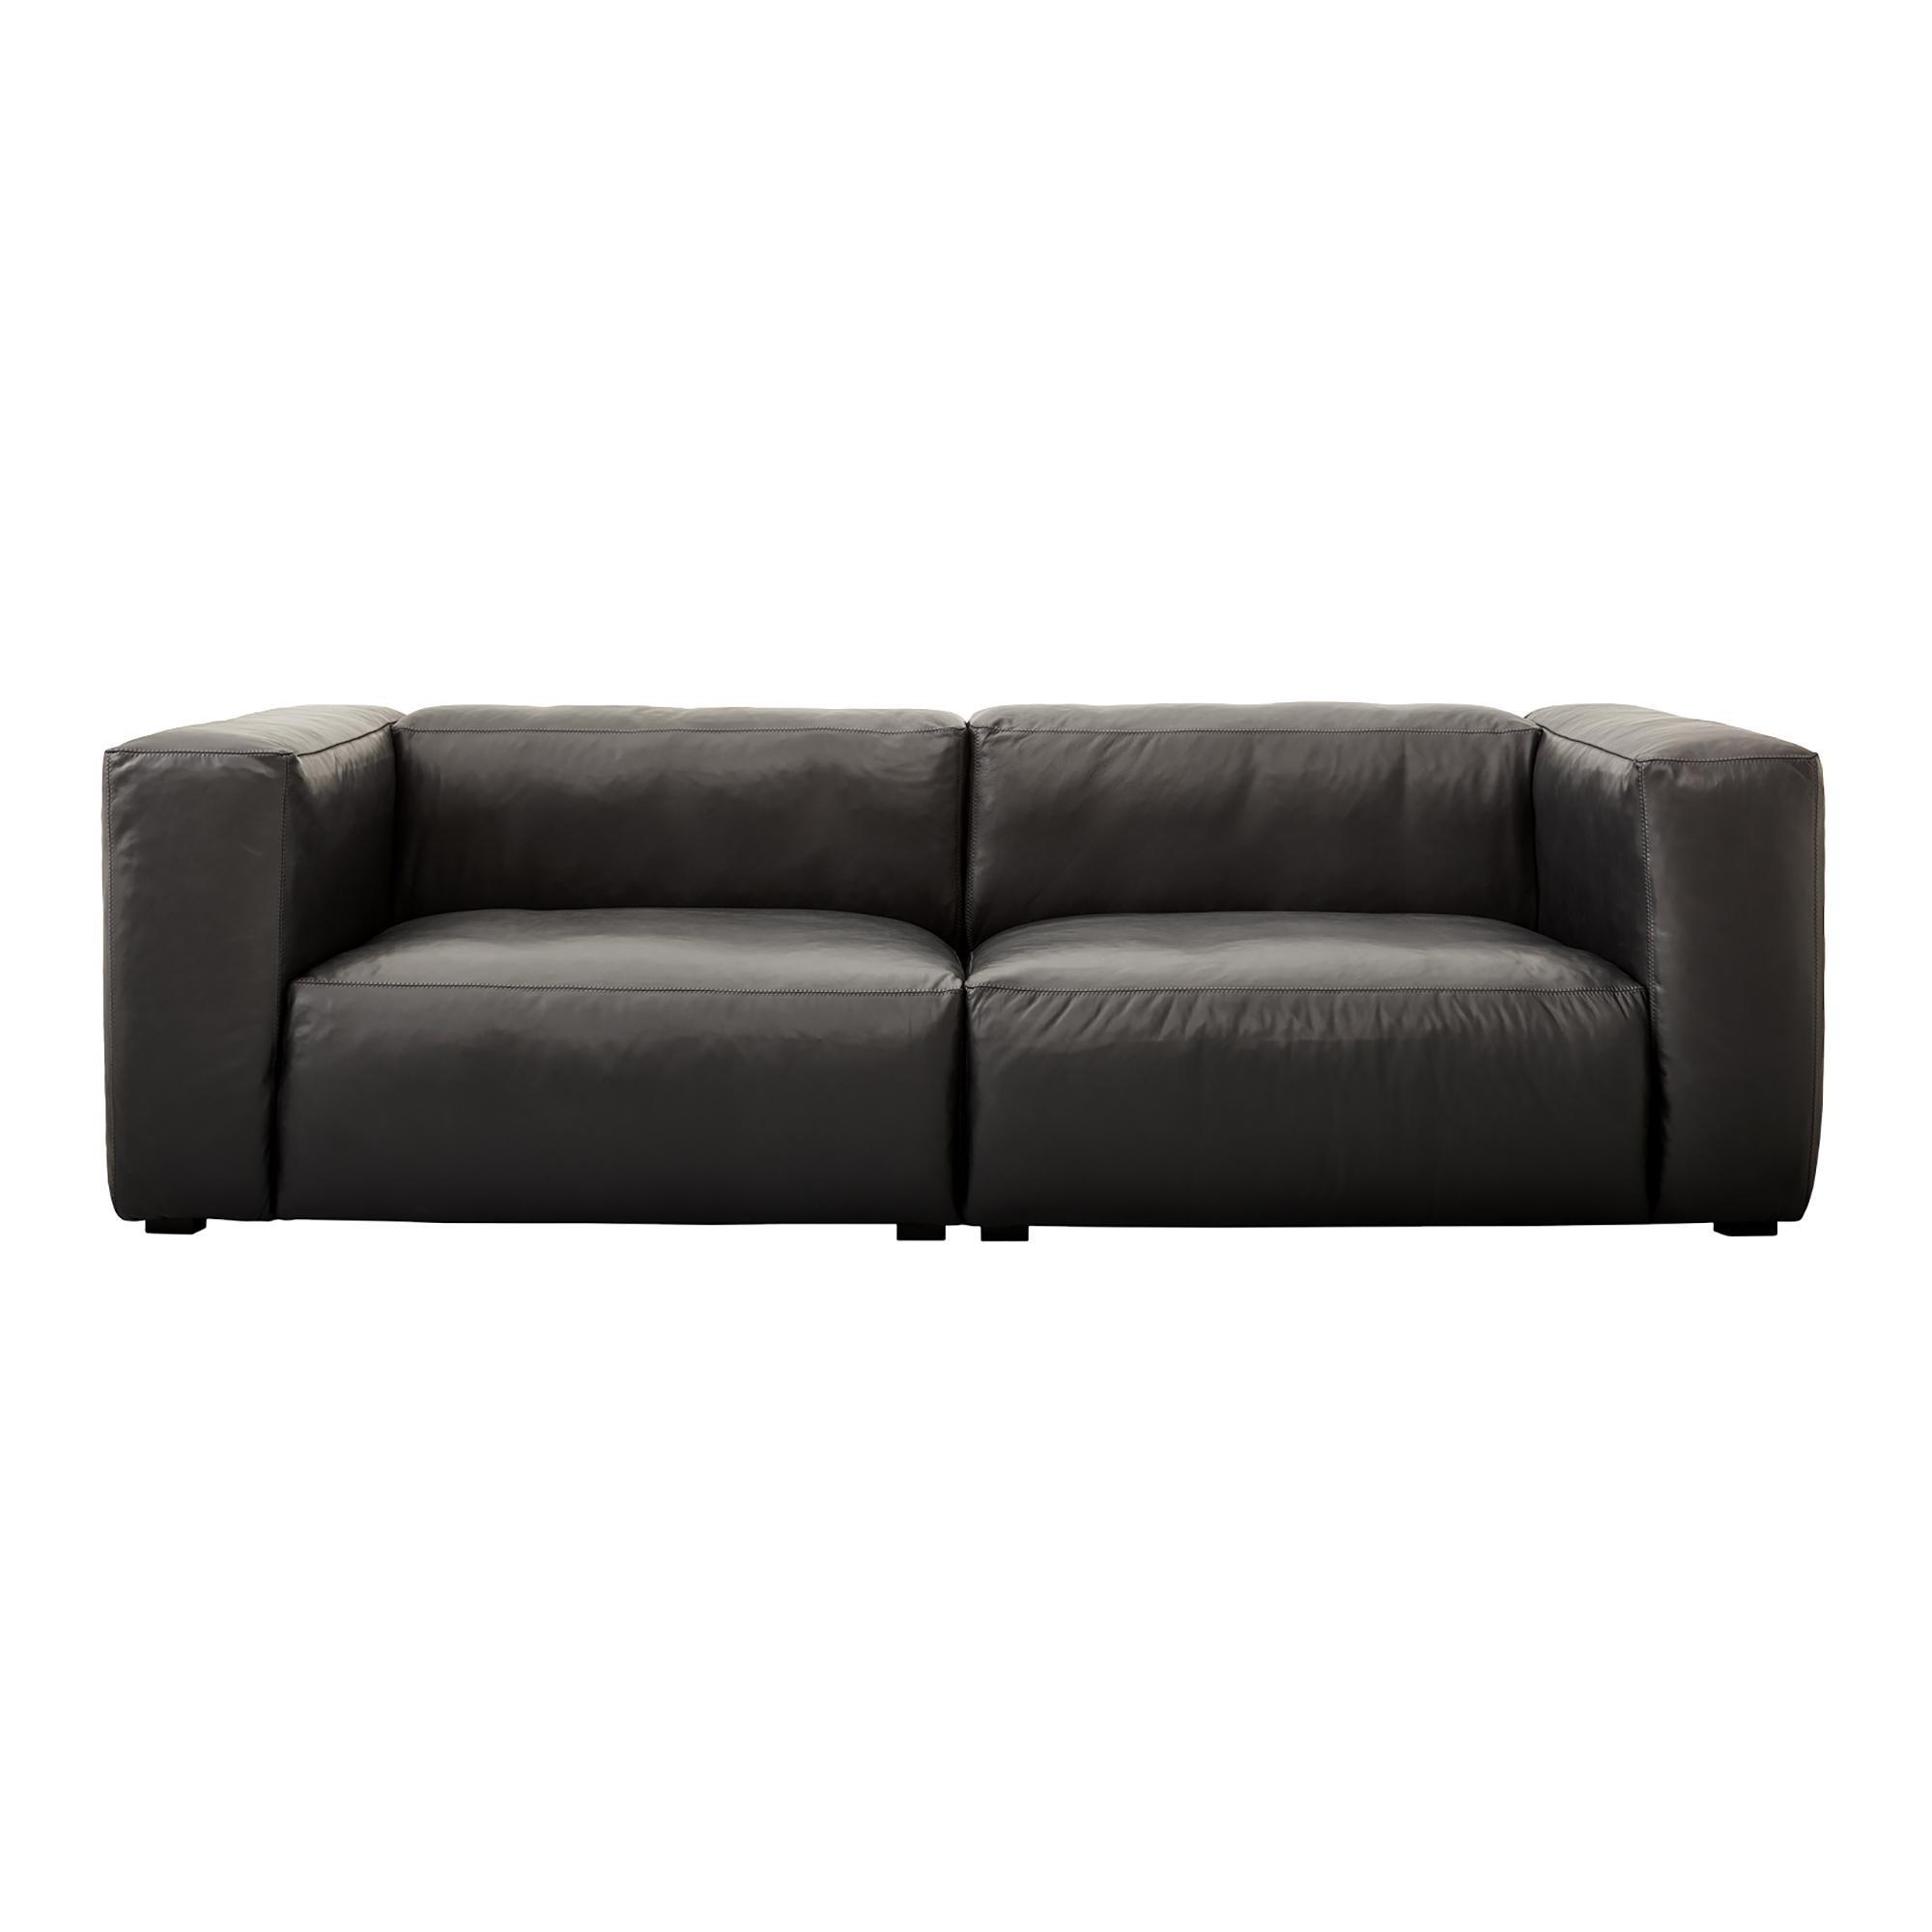 ... HAY   Mags Soft Leather Sofa 228x95.5cm   Black/sofa Legs Black/